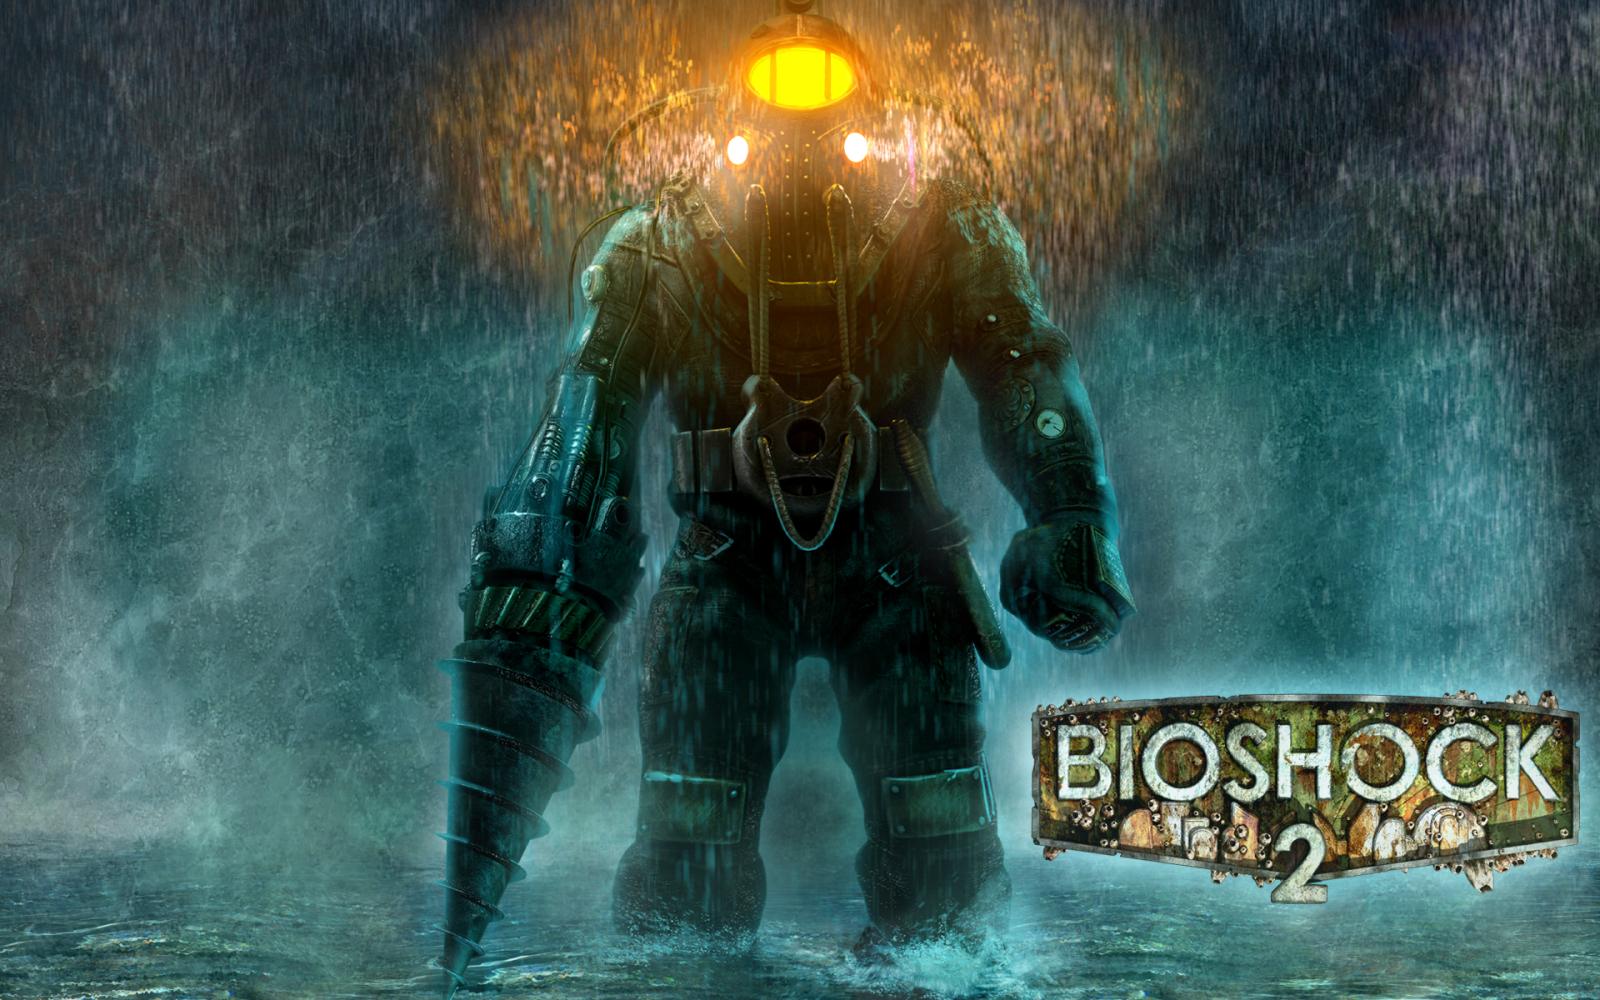 http://4.bp.blogspot.com/_2UbsSBz9ckE/S74zztZXbrI/AAAAAAAABNc/jB-F5OrEfq0/s1600/Officila_Bioshock_2_HD_wallpaper+2.jpg